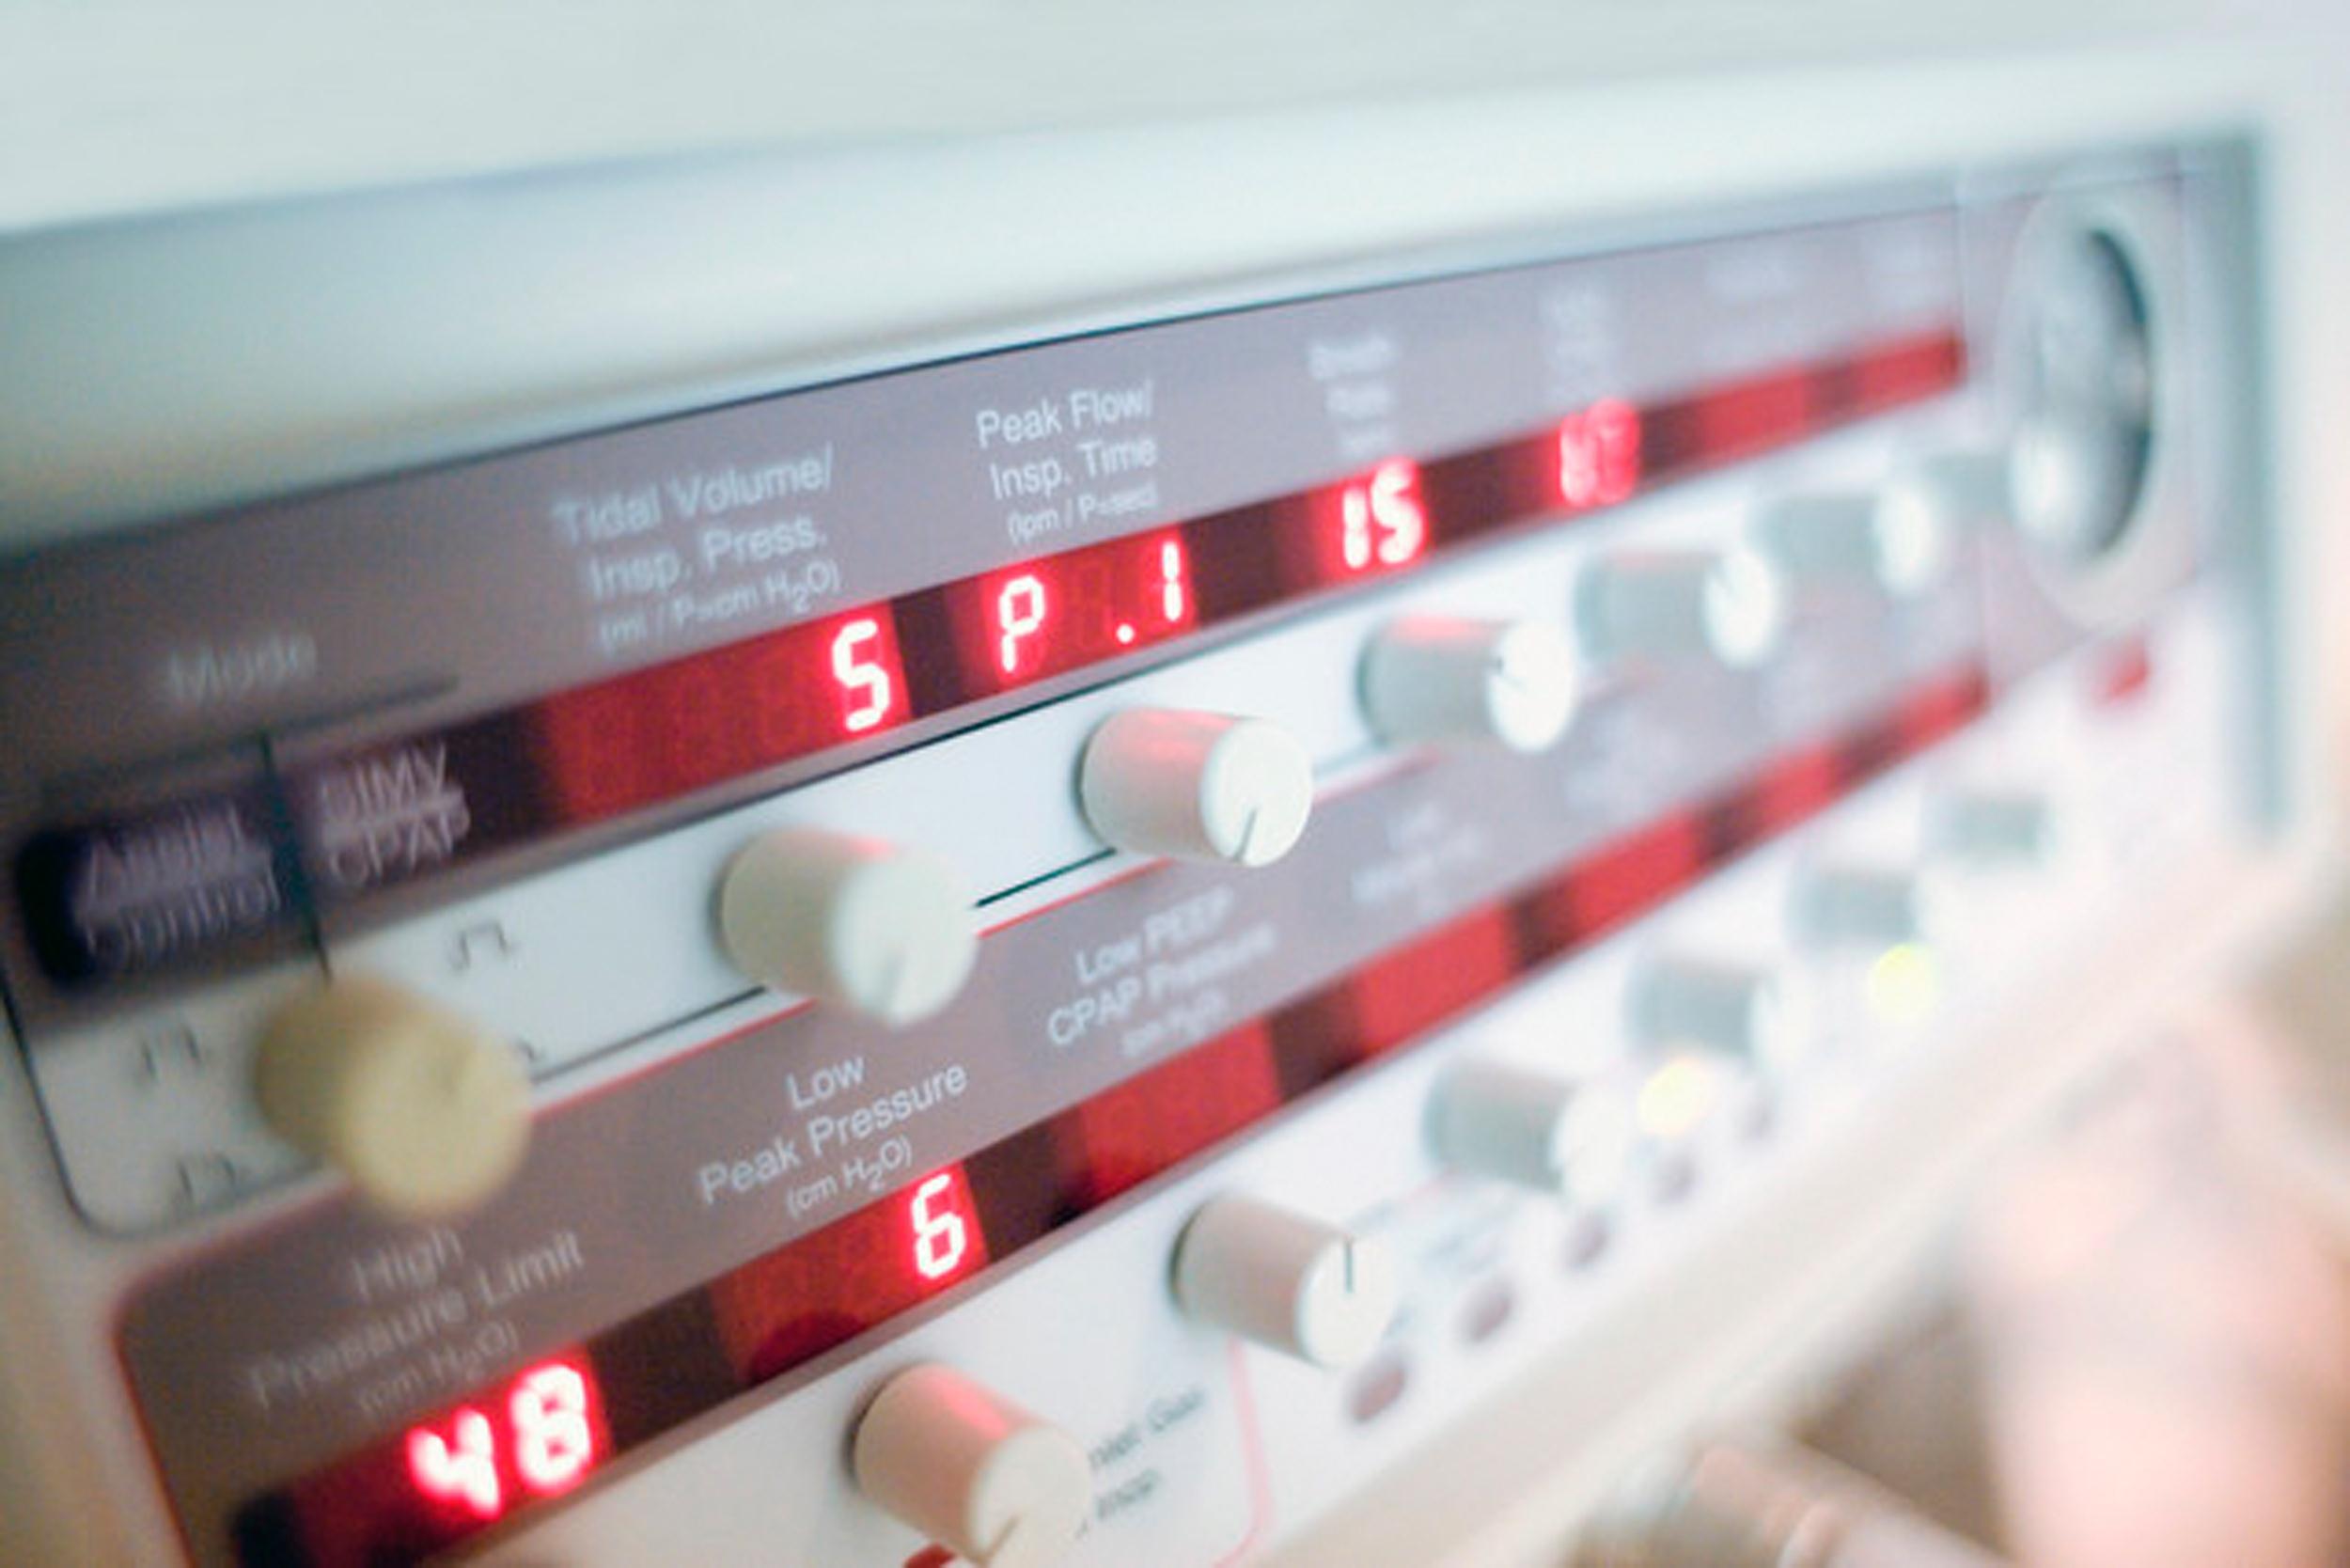 Image: Ventilator machine controls